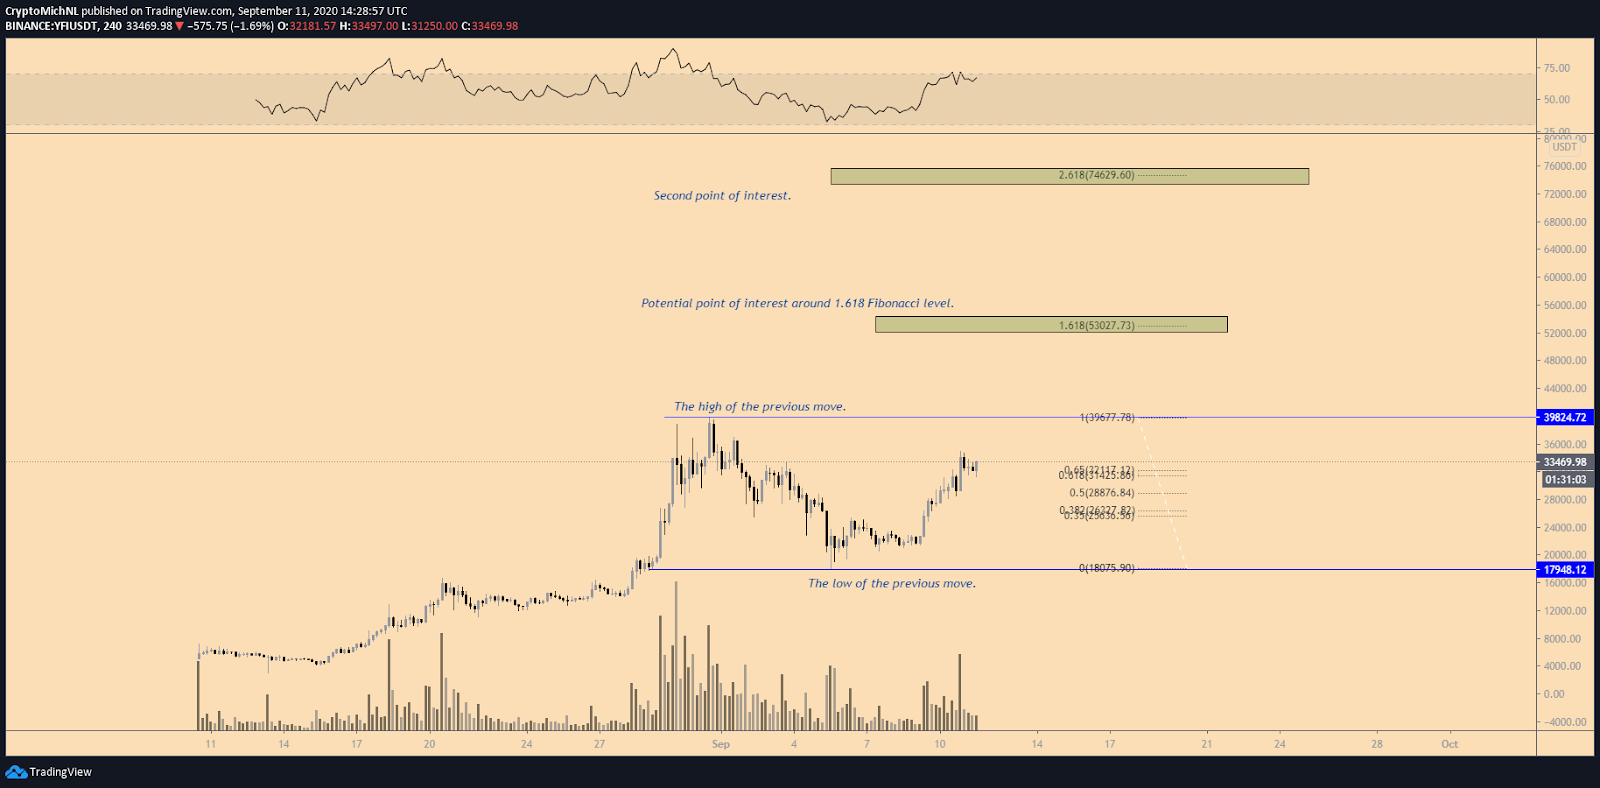 YFI/USDT 4-hour chart